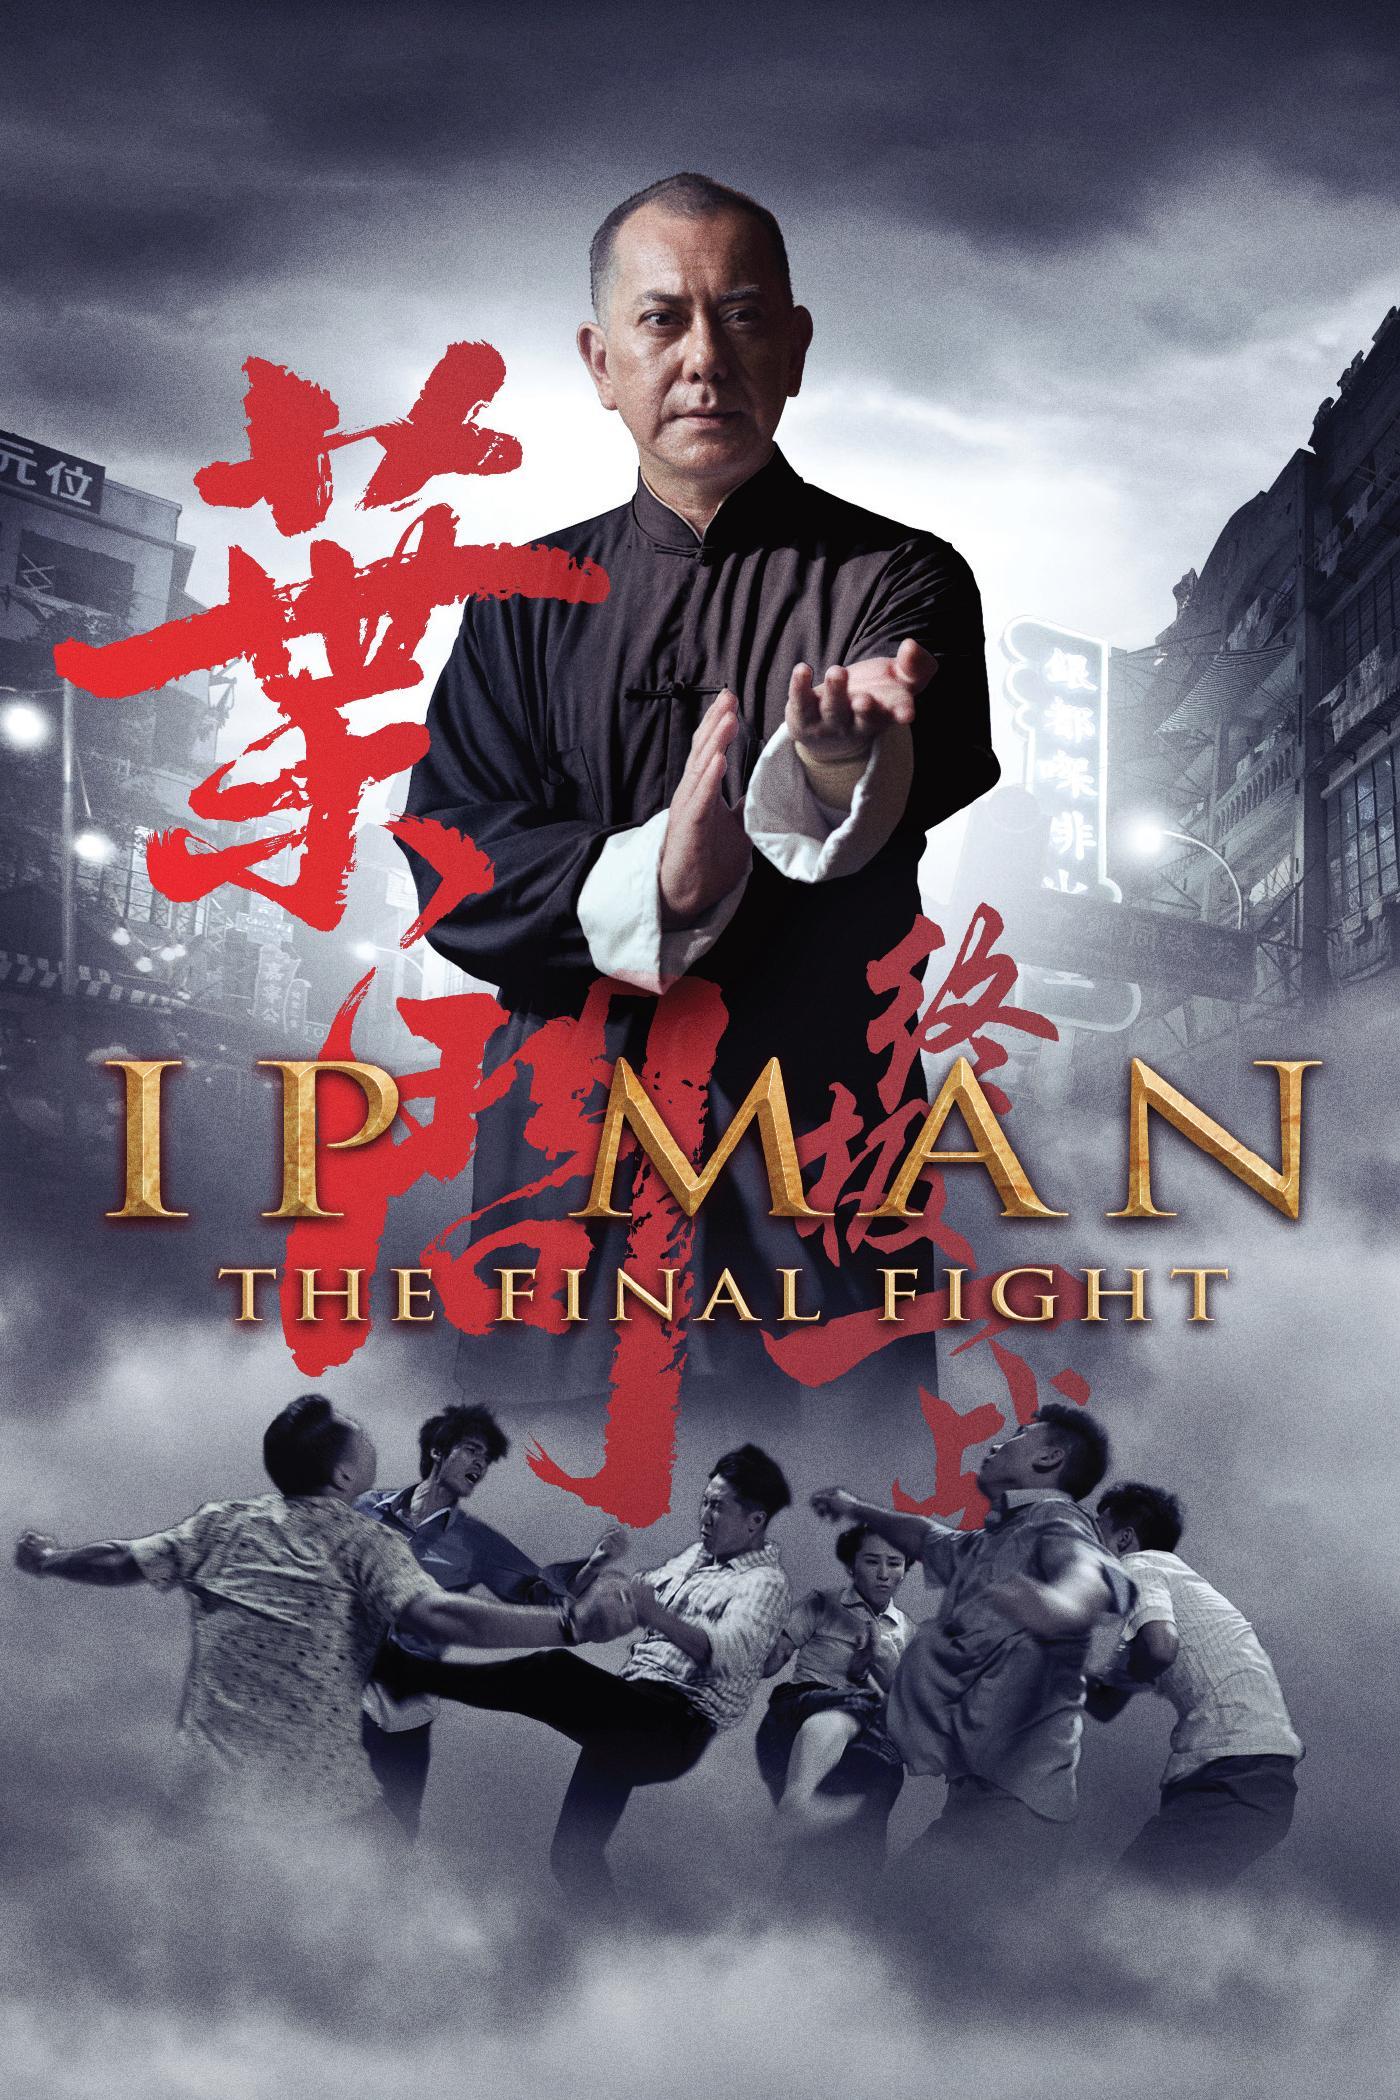 IPManTheFinalFight POSTER jpgIp Man The Final Fight Movie Poster